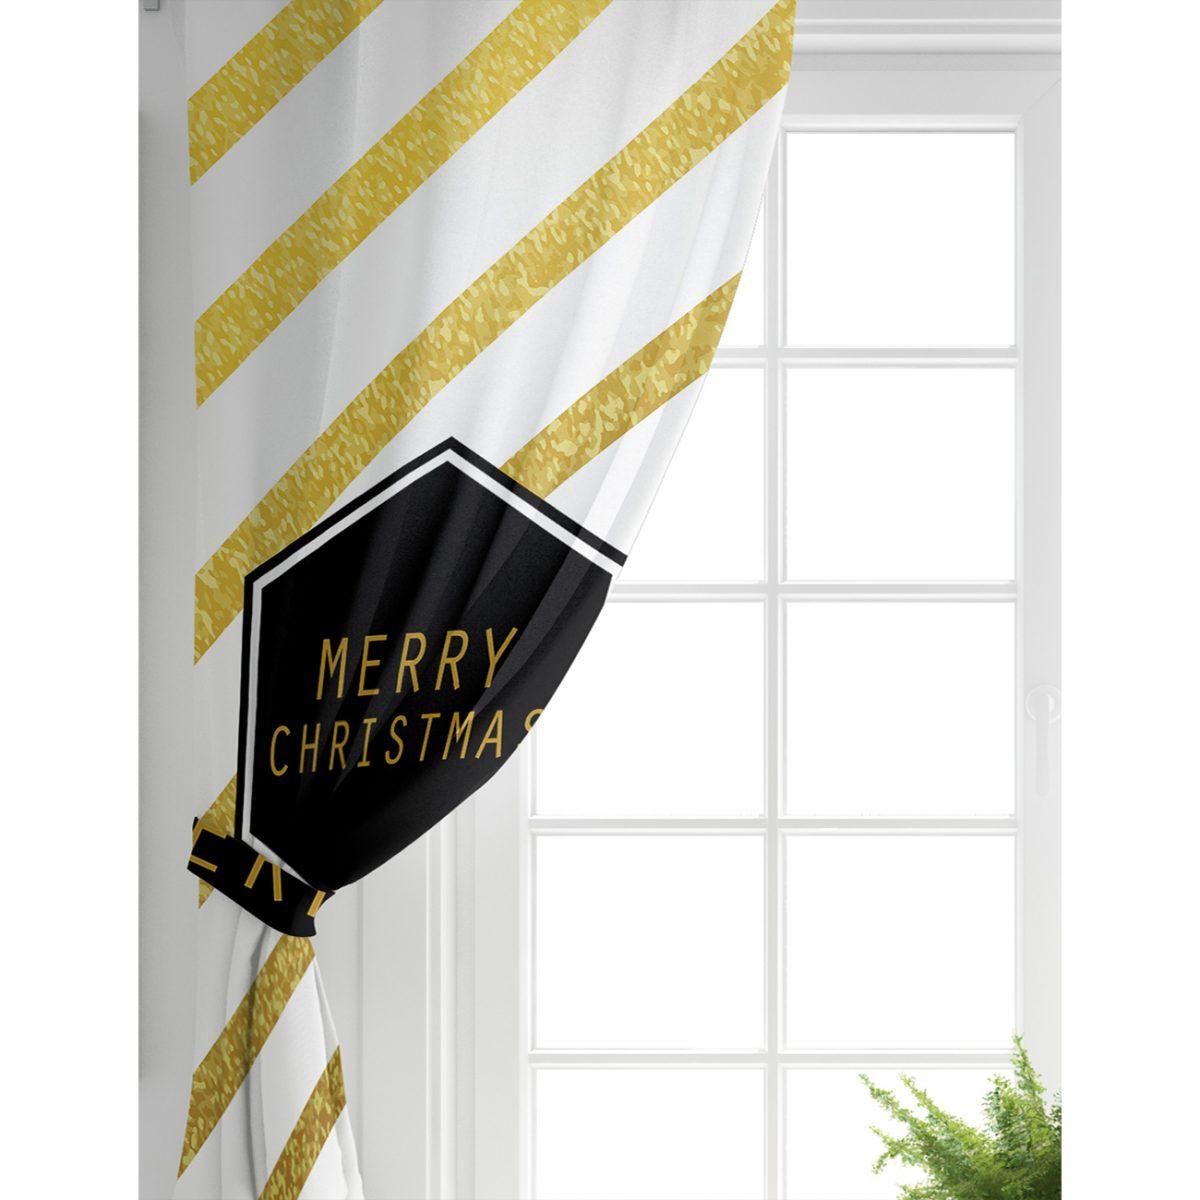 Altın Şeritli Merry Christmas Desenli Salon Fon Perde Realhomes